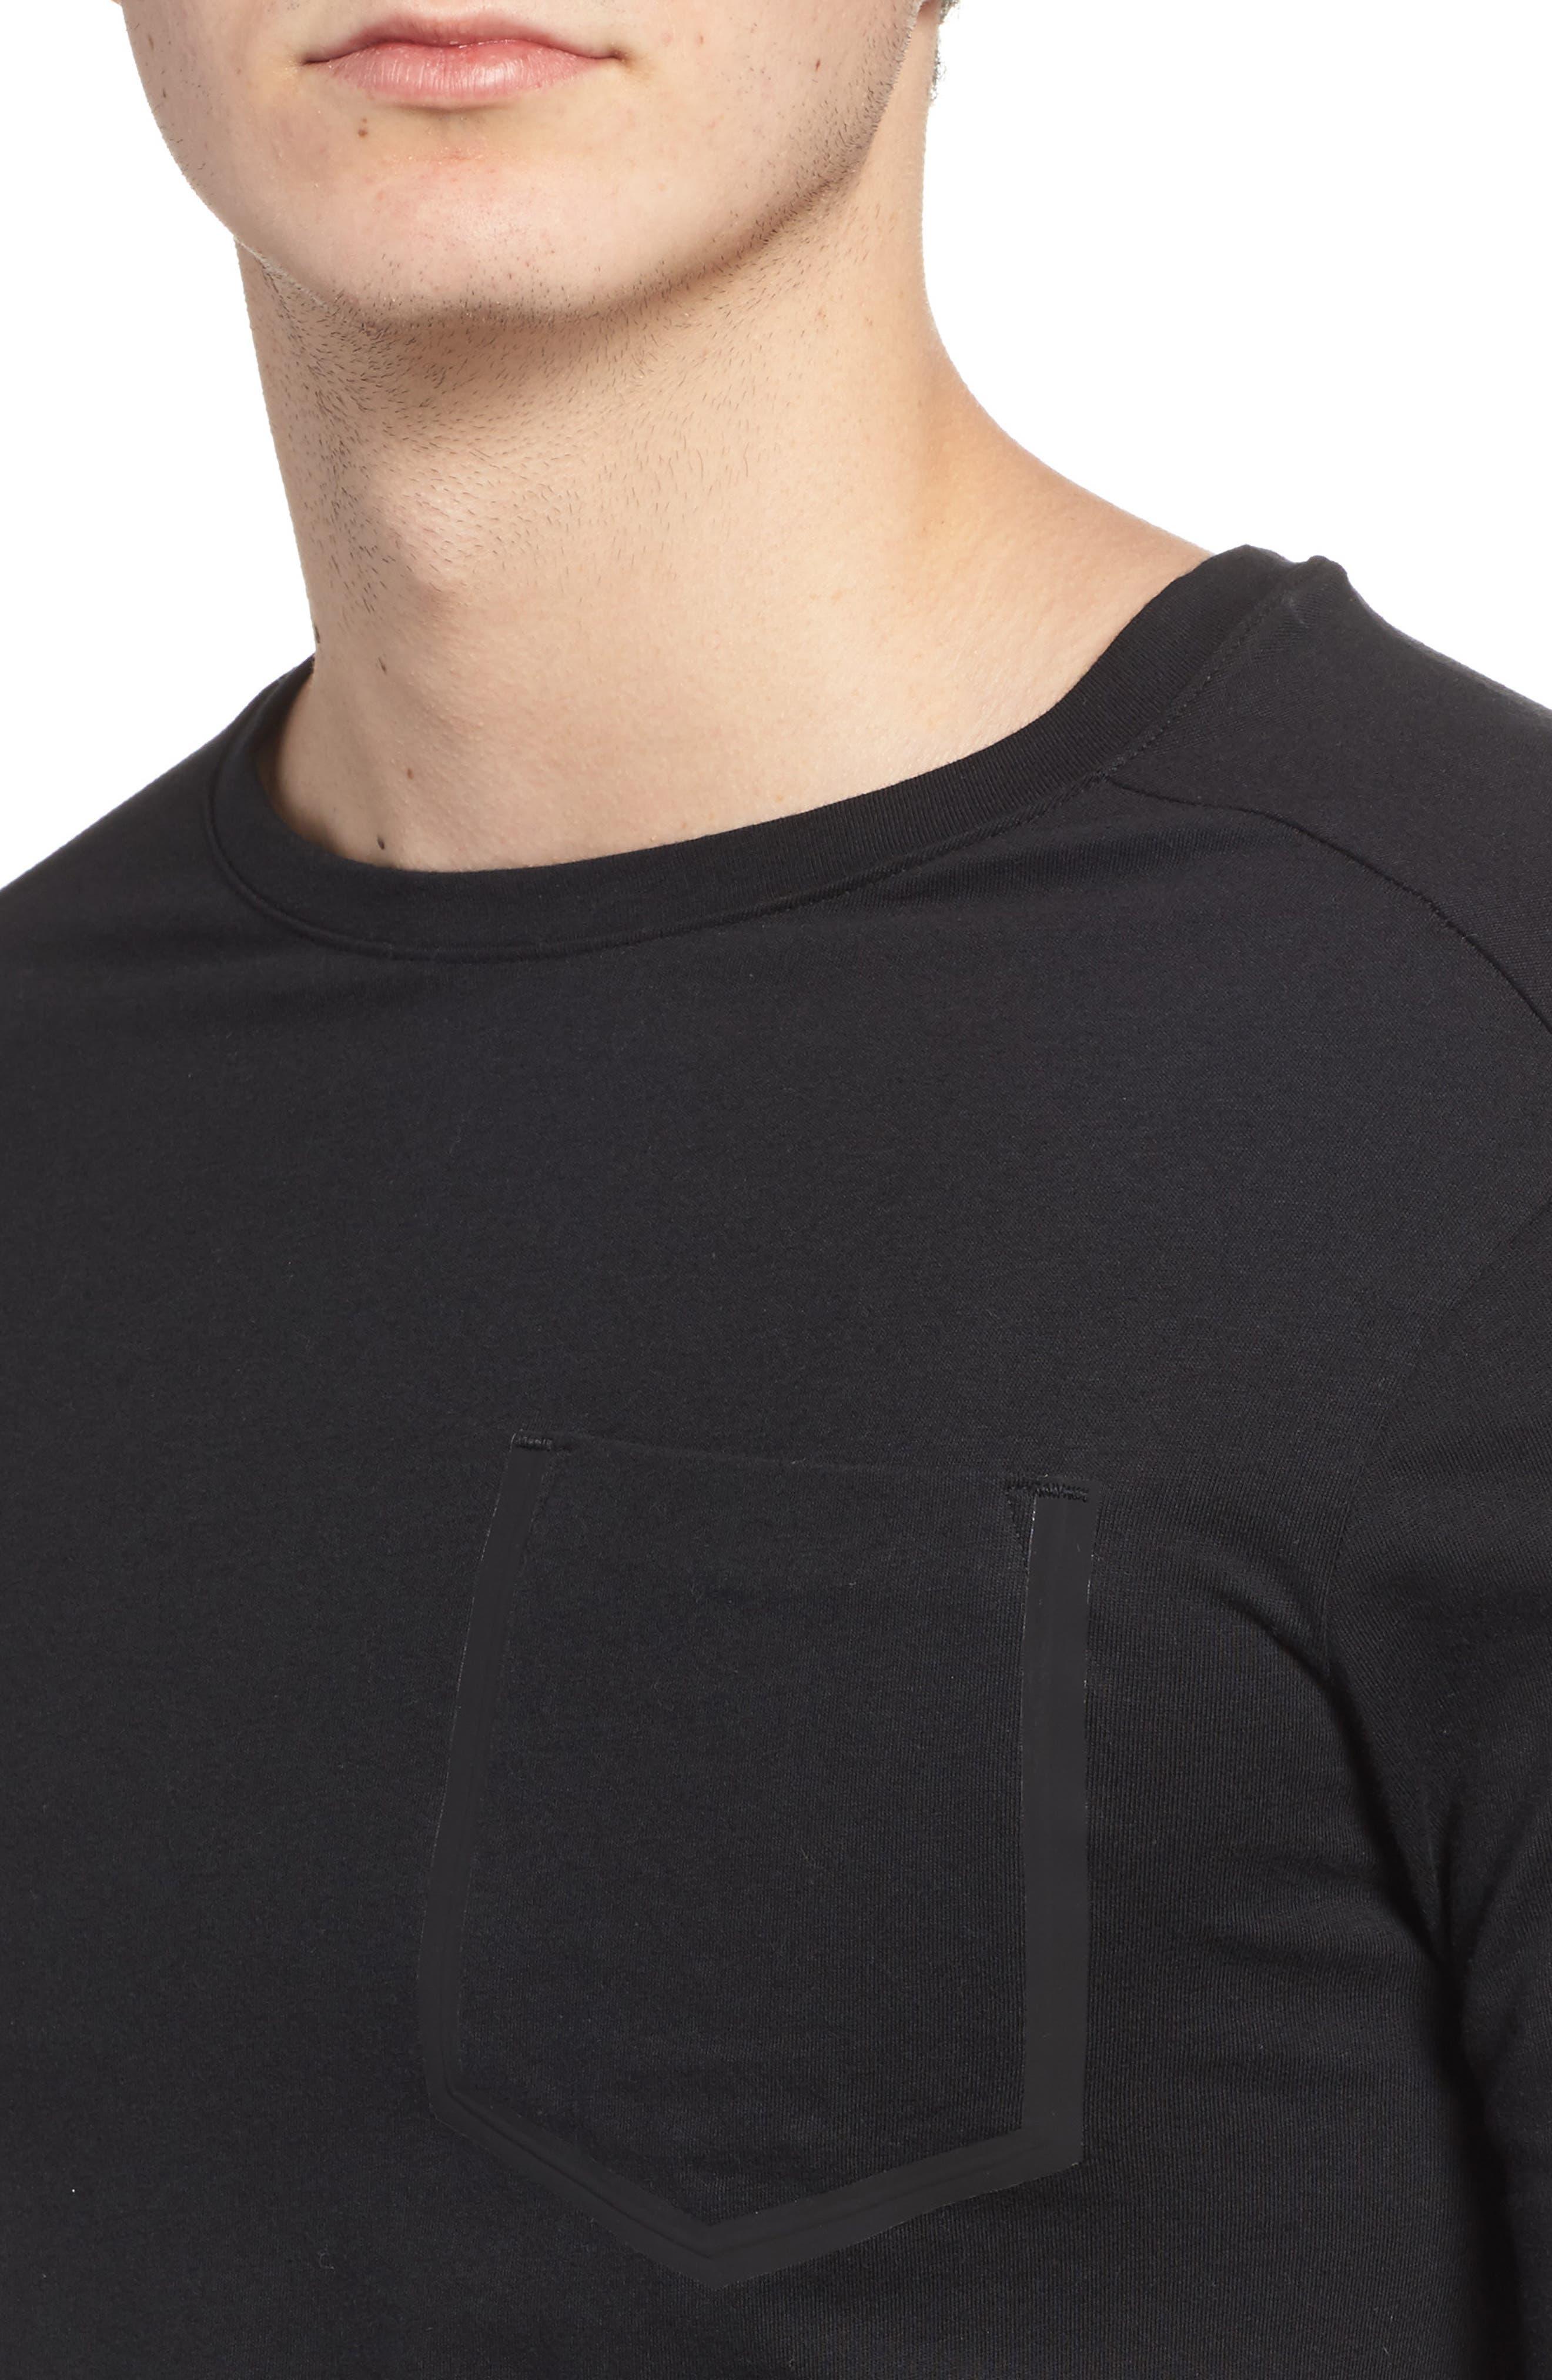 Training Supply Move Crewneck T-Shirt,                             Alternate thumbnail 4, color,                             Black